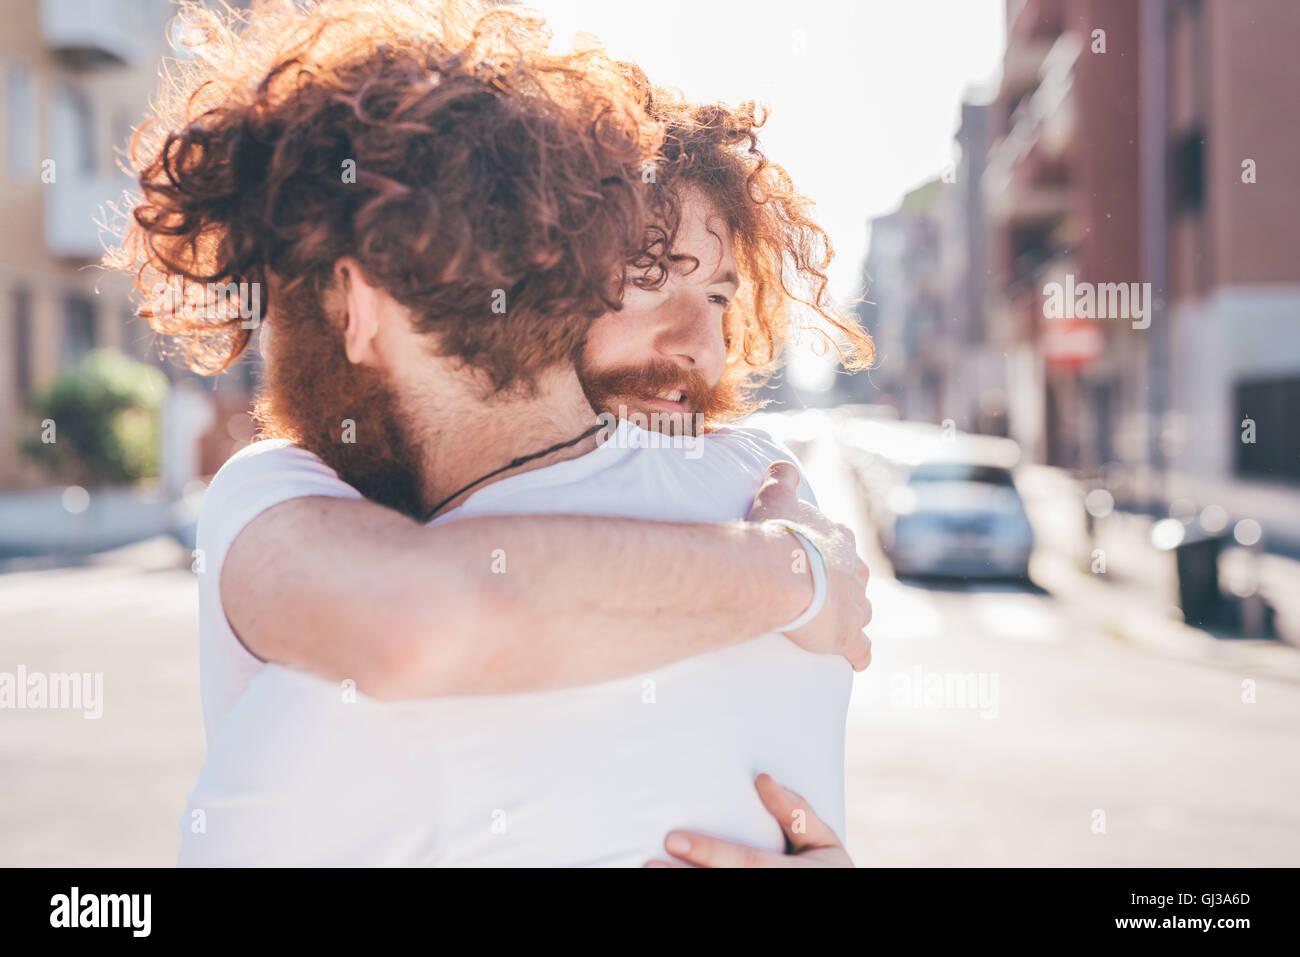 Jeune homme aux cheveux rouges jumeaux hipster et barbes hugging on city street Photo Stock